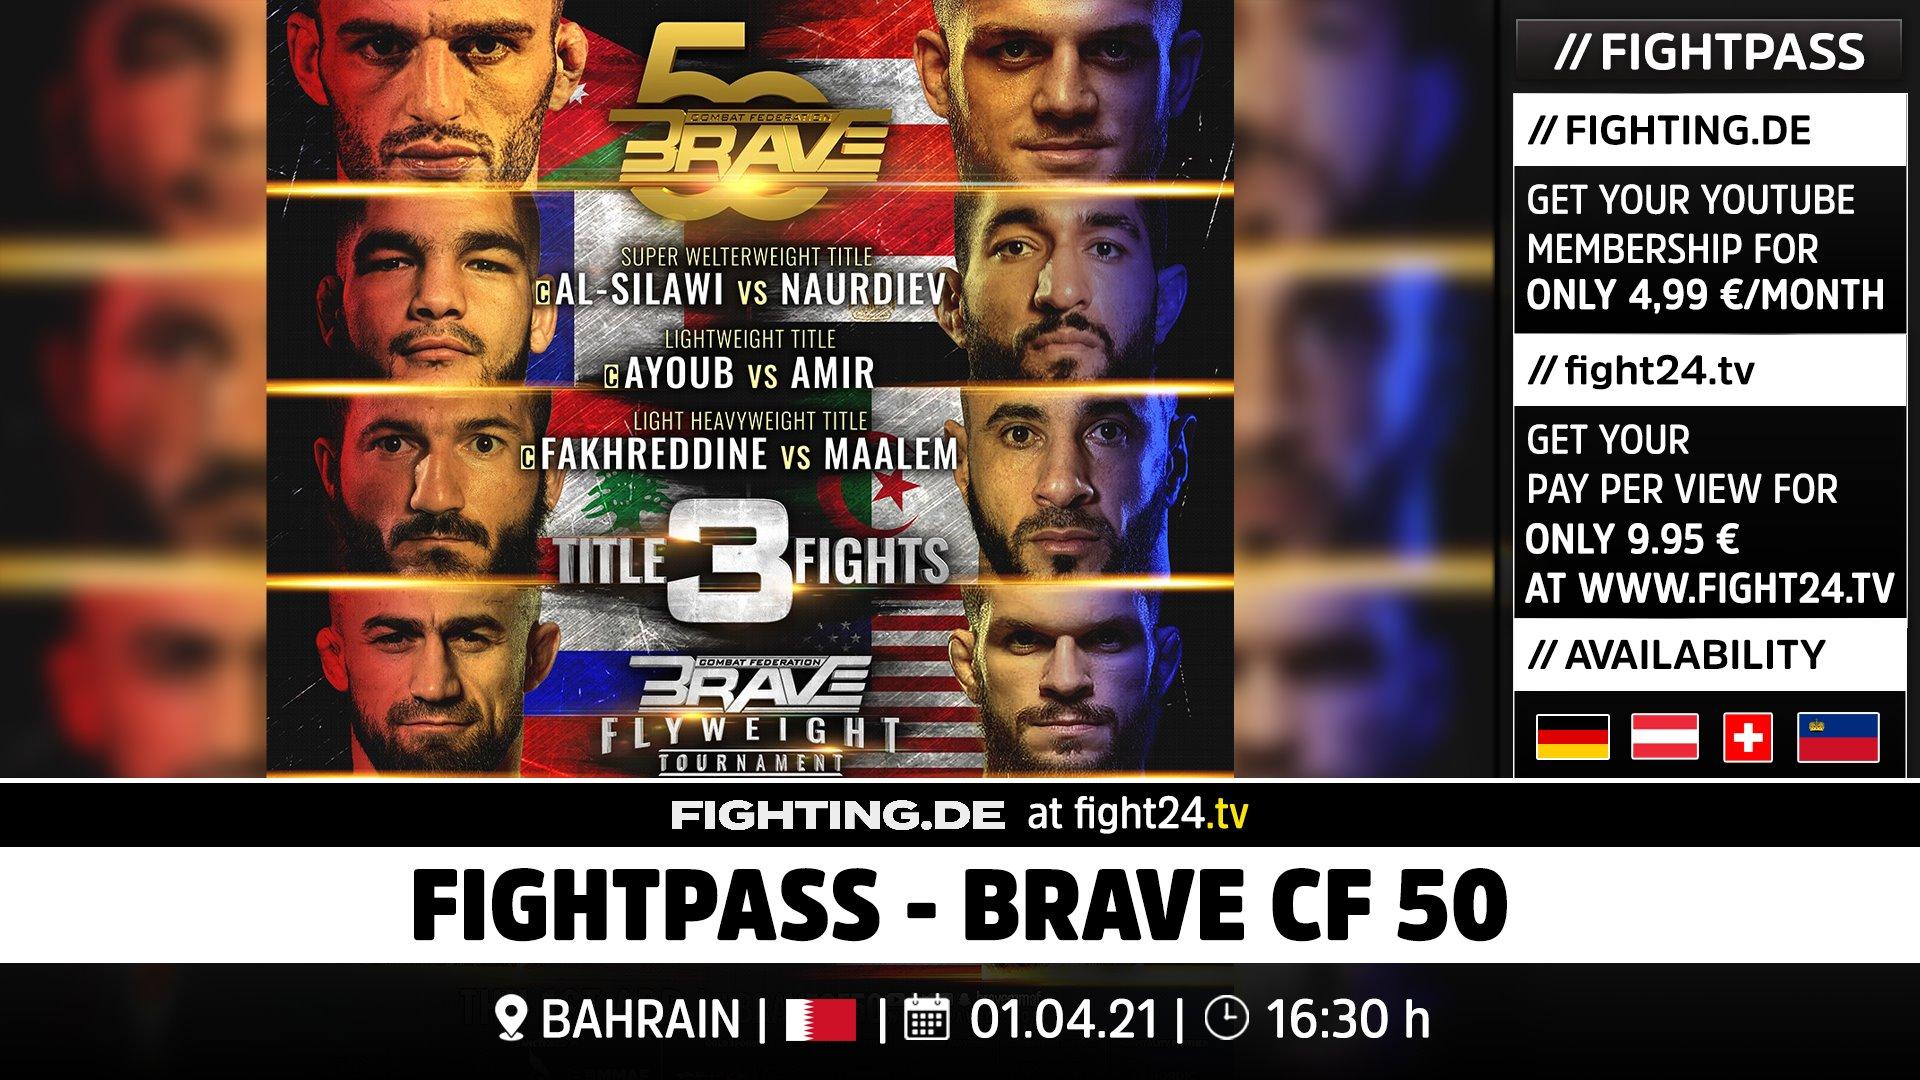 Brave 50